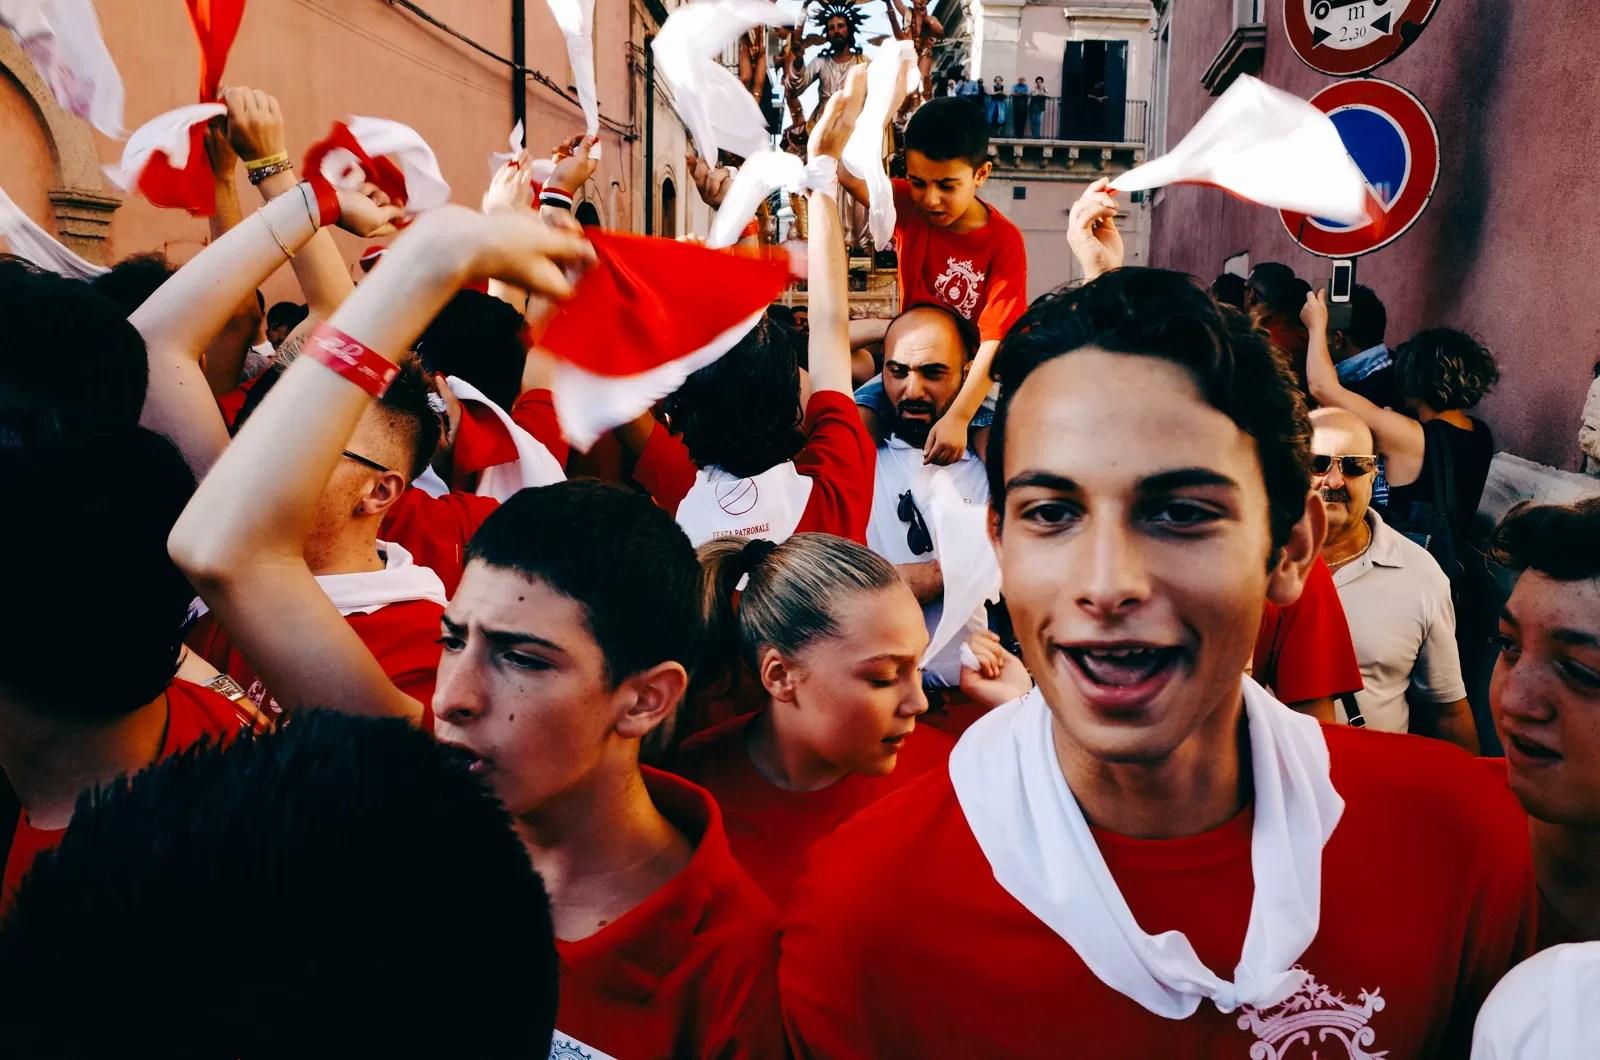 R0004818 - Siciliani in festa 18 Agosto 2015  (Parte 1) Street Photography Session - fotostreet.it